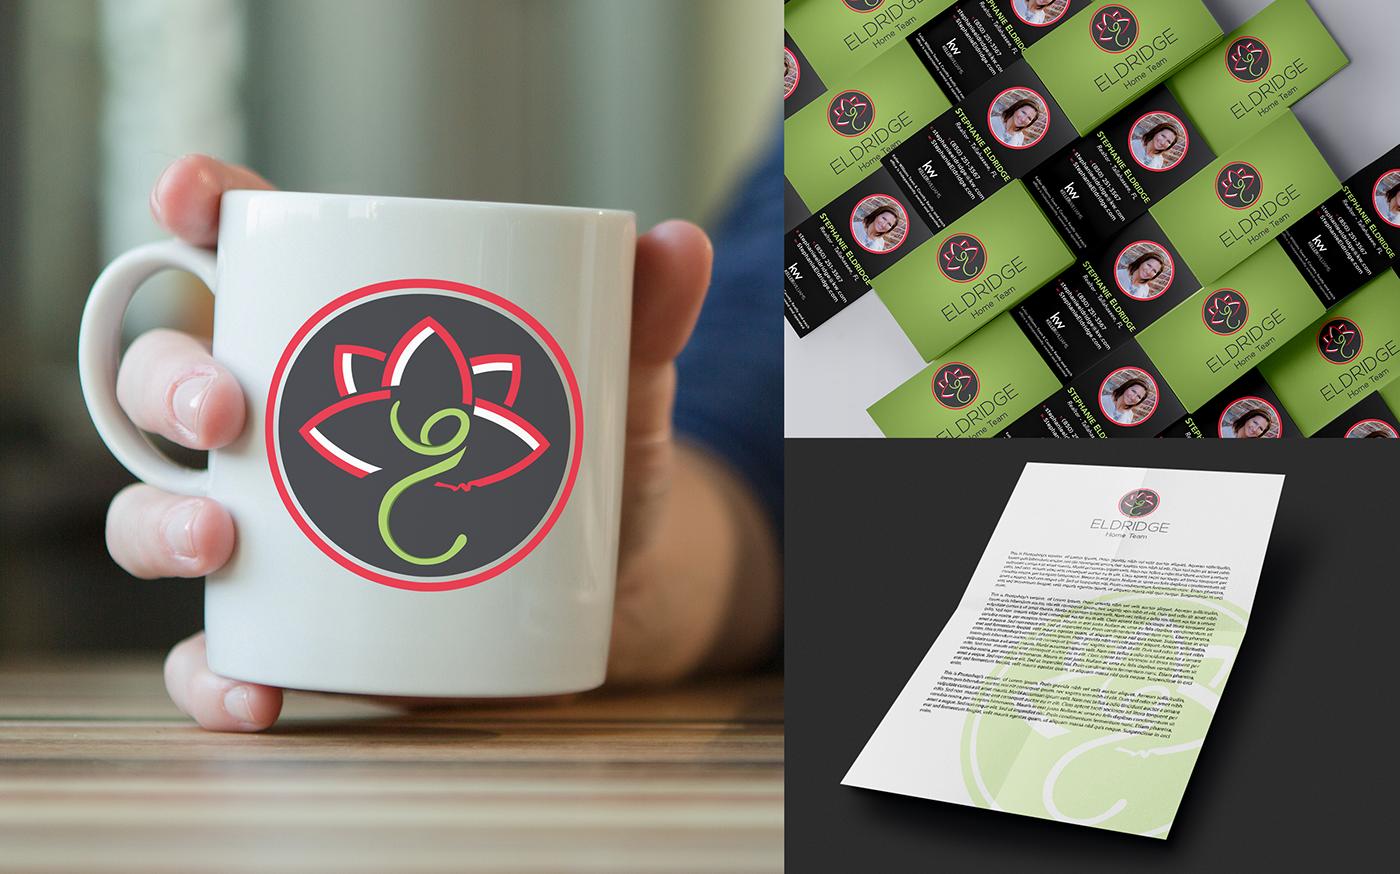 Show a mug mock up and business cards mock up.